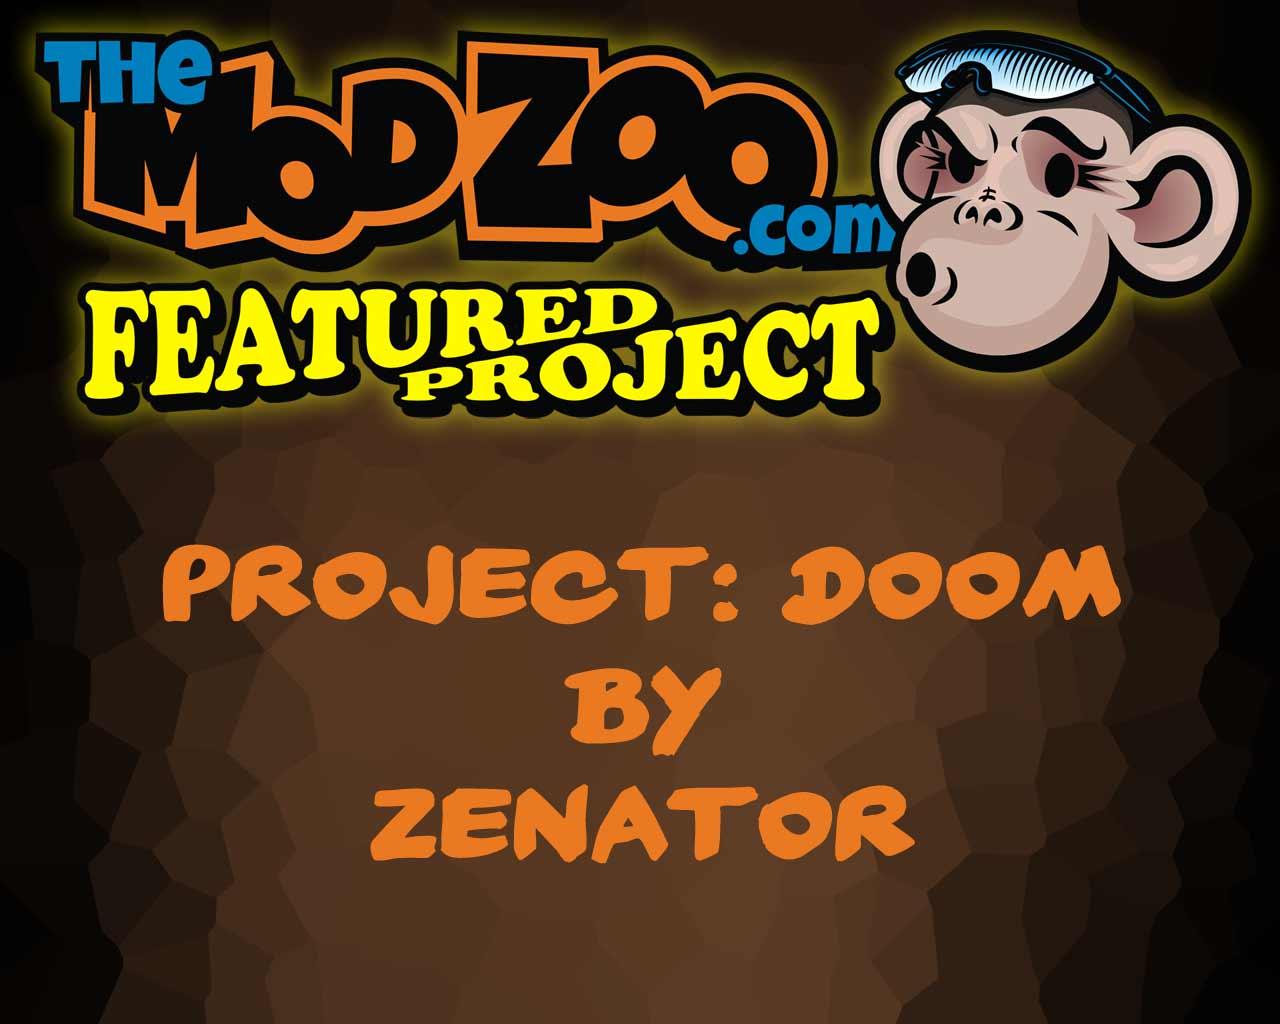 featured_projects_project_doom_zenator